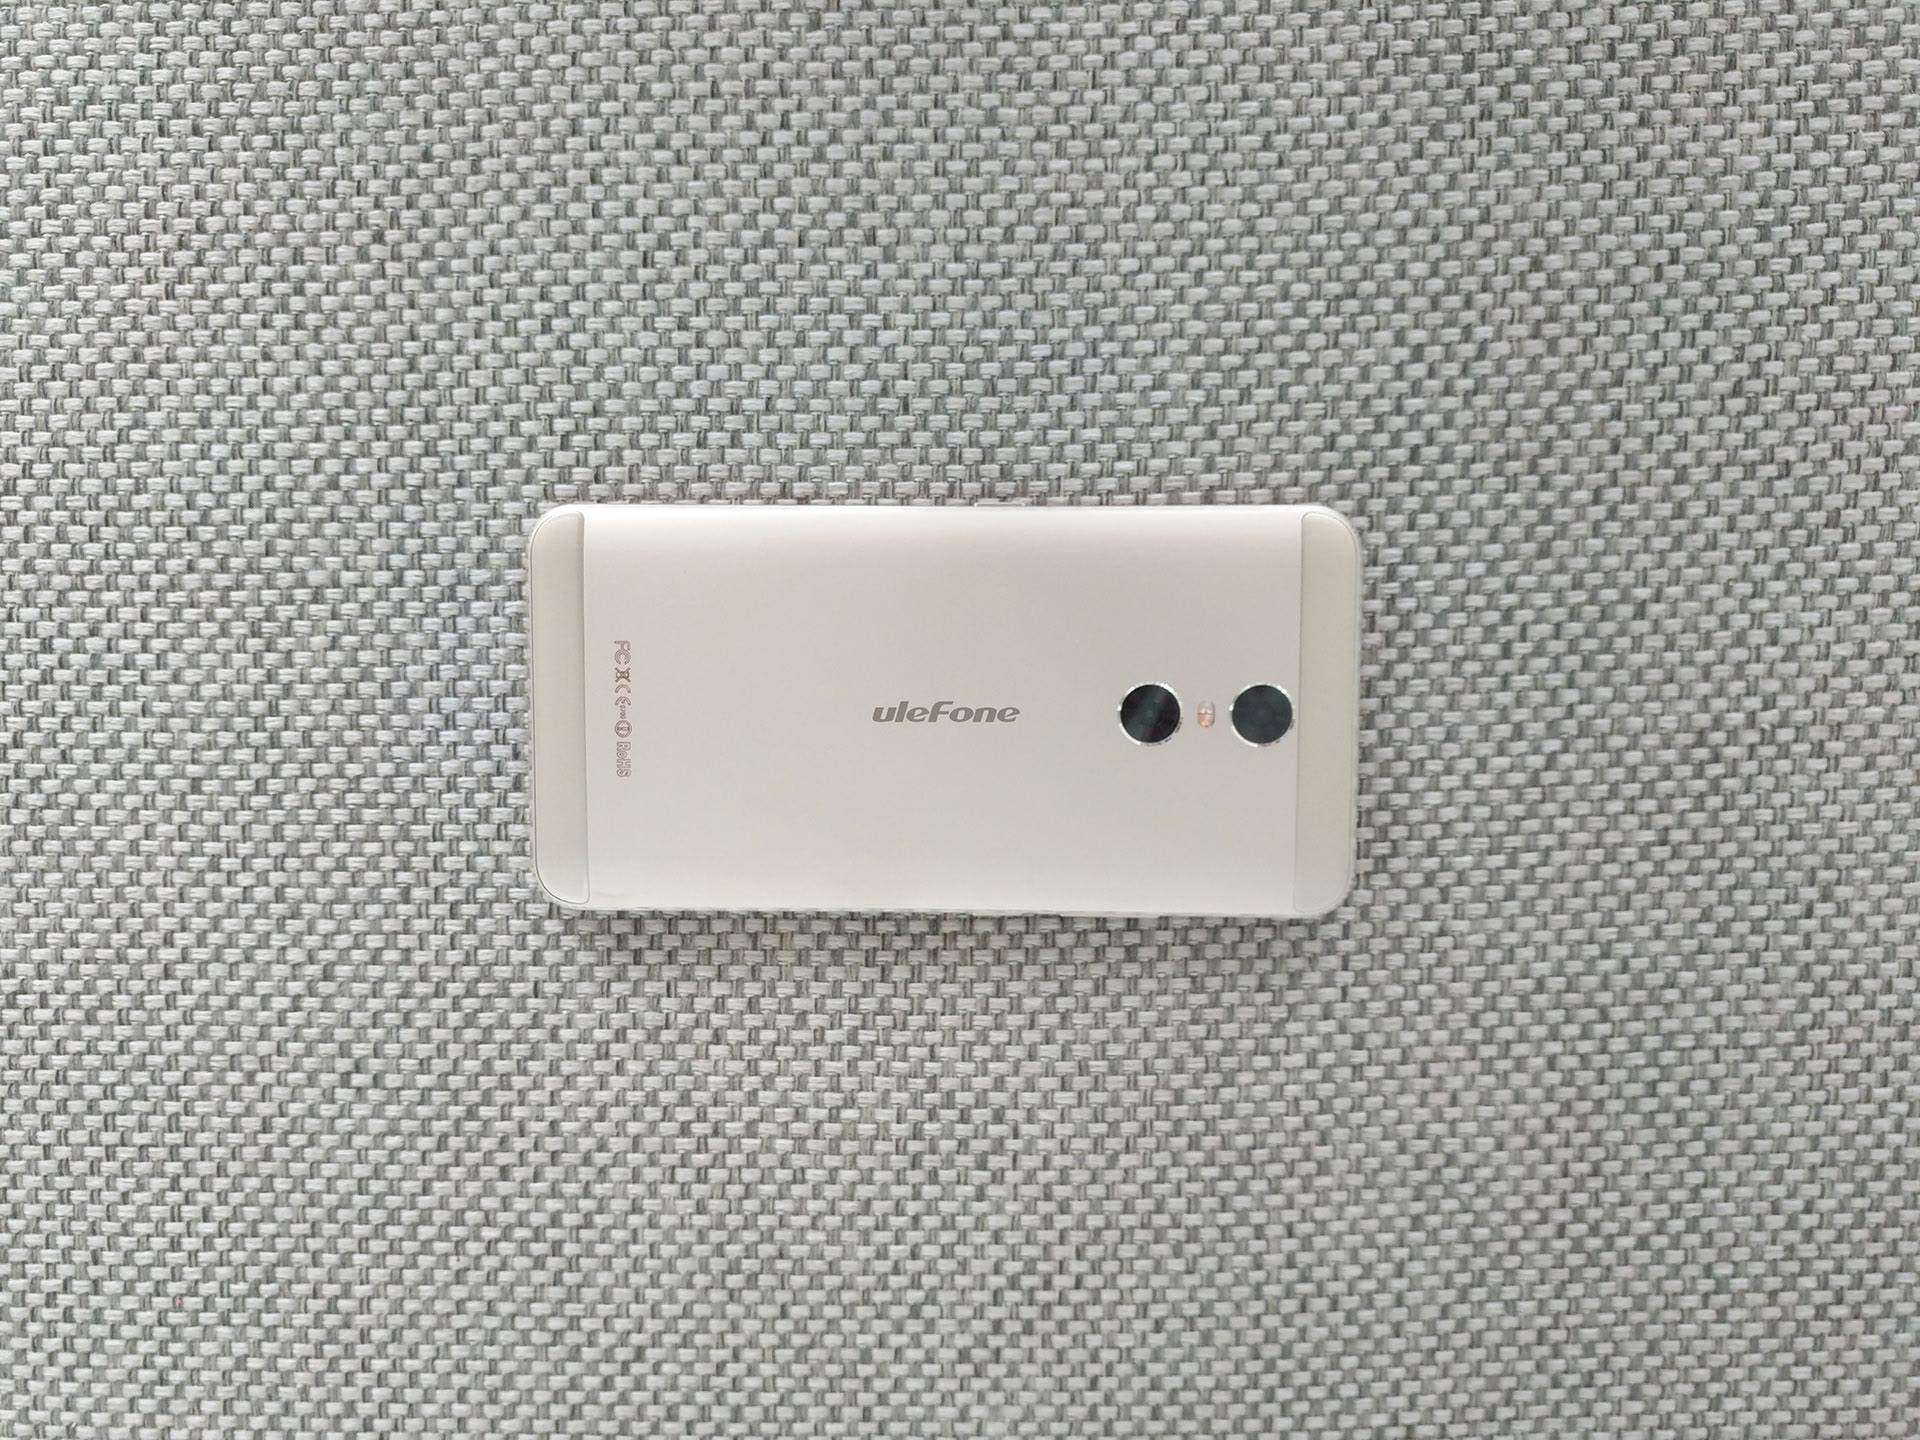 dual rear camera Ulefone